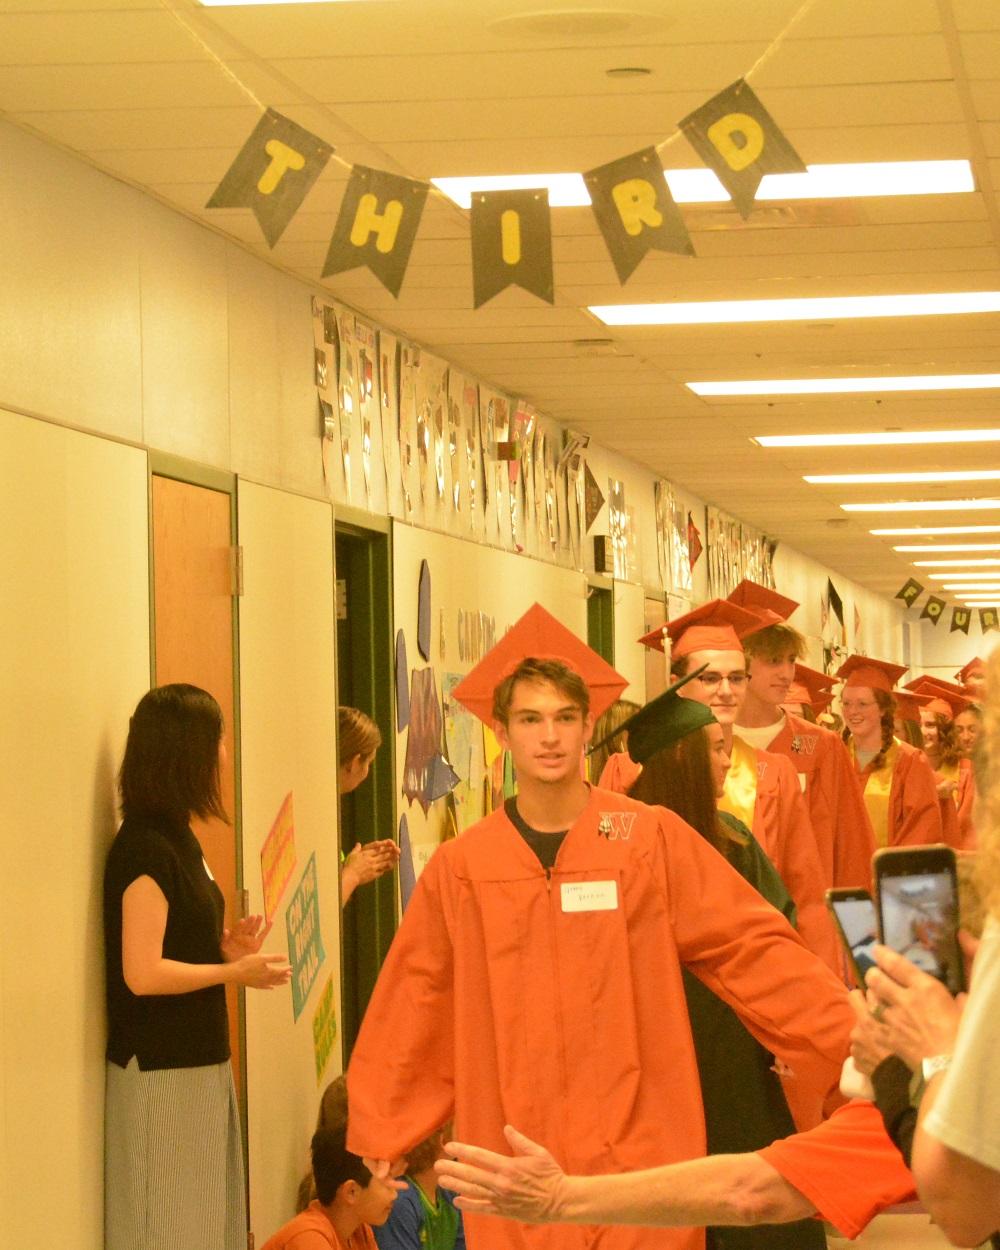 Seniors+walk+down+a+hallway+as+parents%2C+students%2C+and+teachers+congratulate+them.